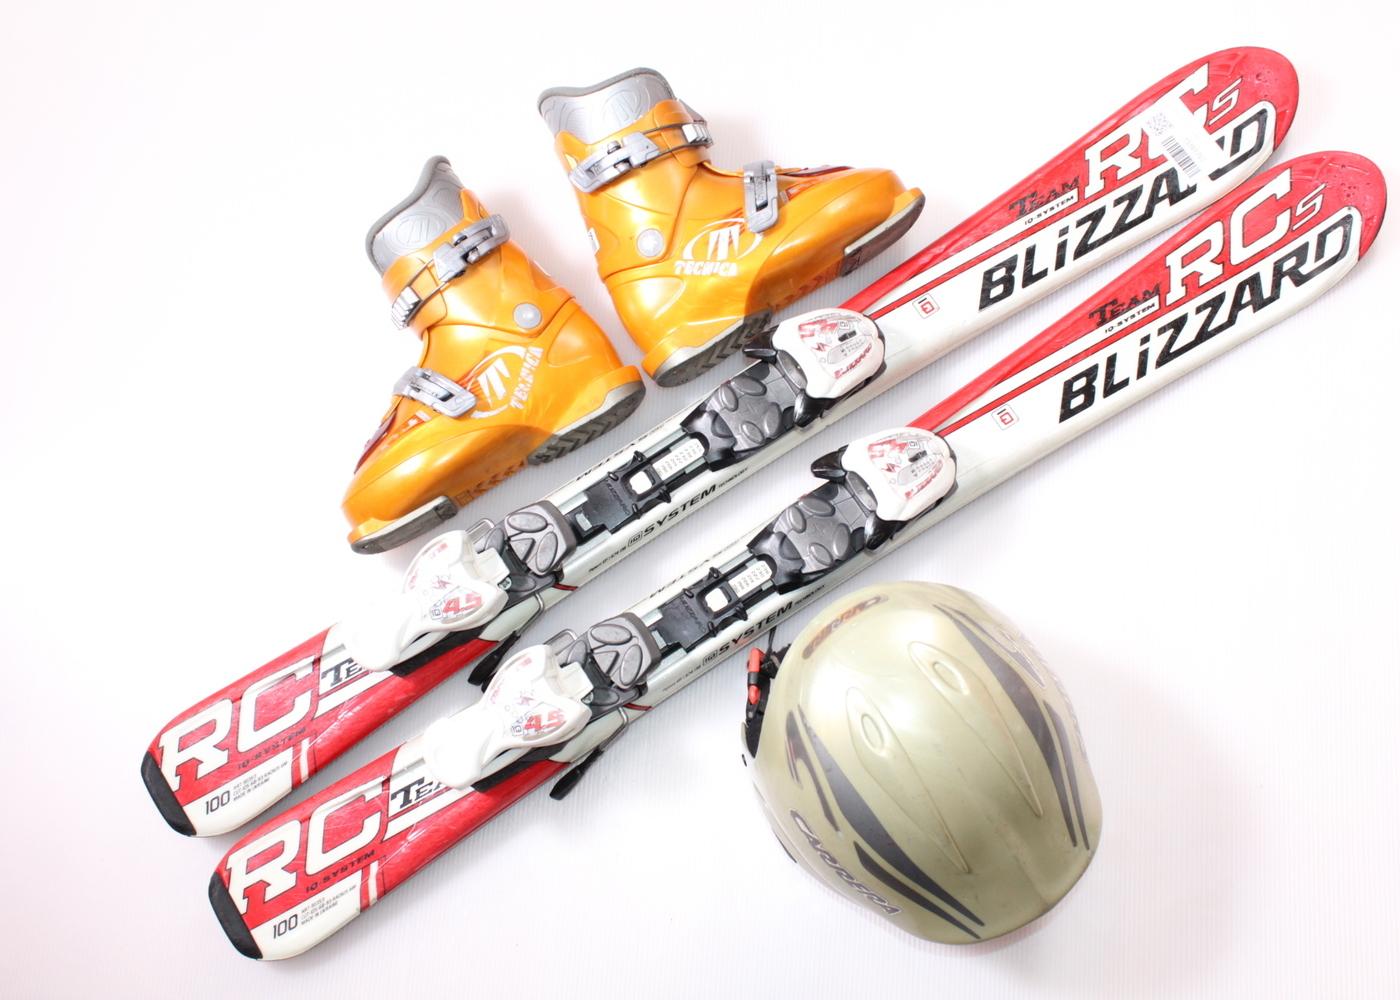 Dětské lyže BLIZZARD RCS TEAM 100 cm + lyžáky  31EU + helma